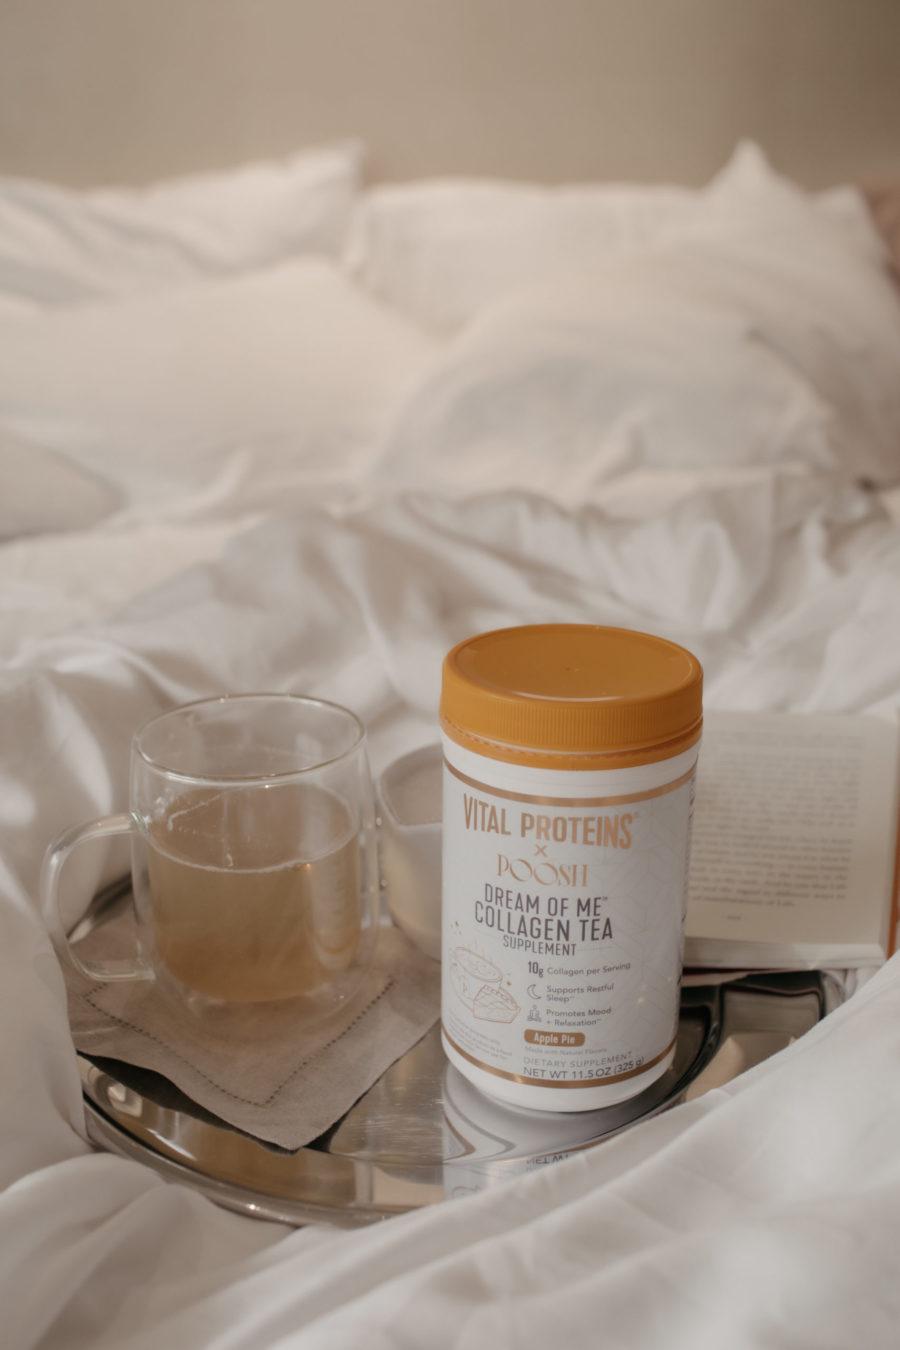 Vital Proteins x Poosh Dream of me tea